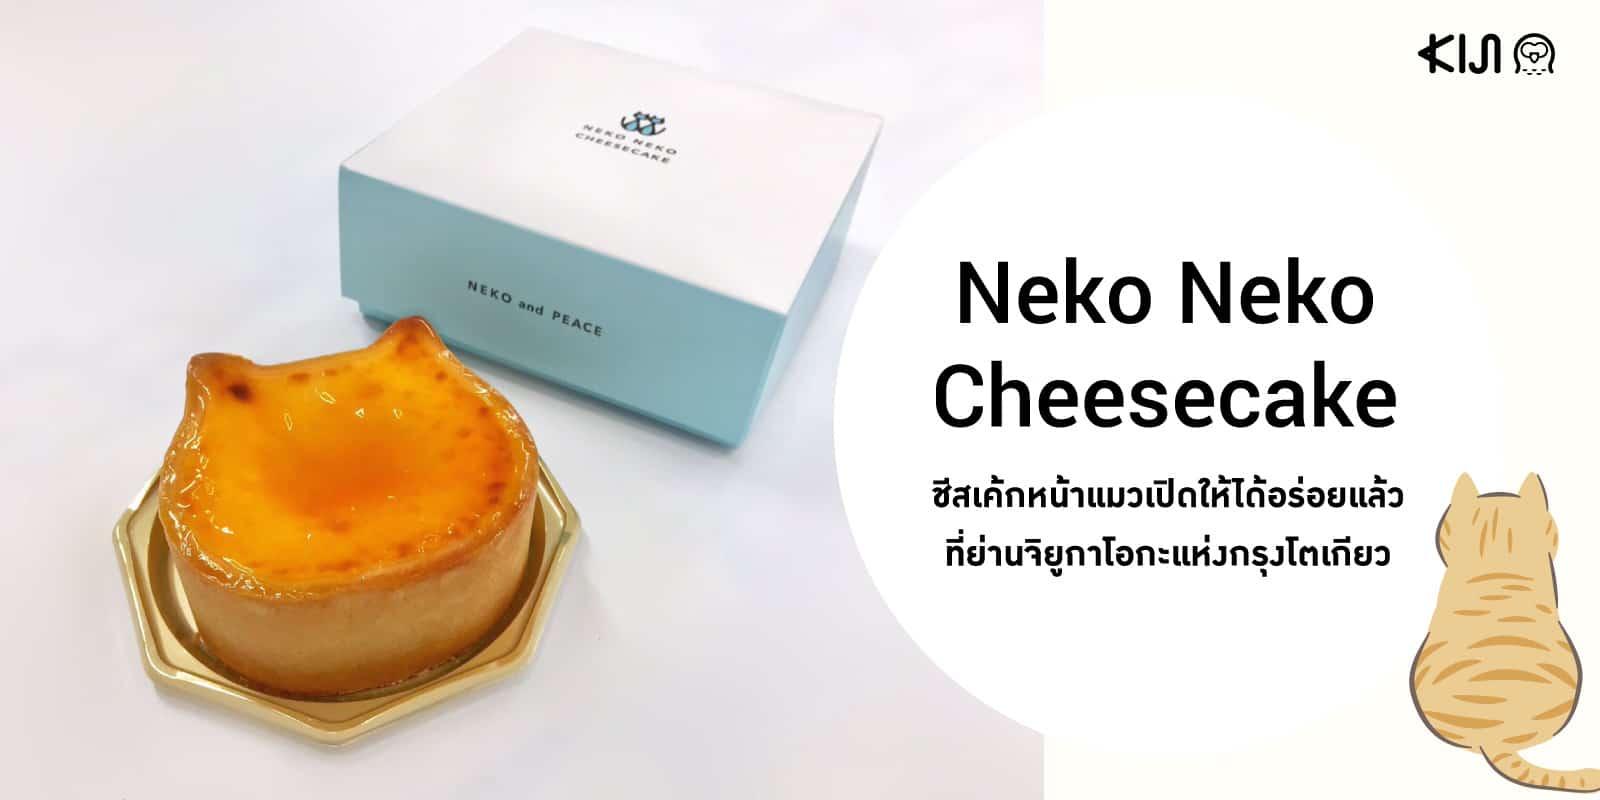 Neko Neko Cheesecake ชีสเค้กหน้าแมวสาขาแรกที่ย่านขนมหวานจิยูกาโอกะ